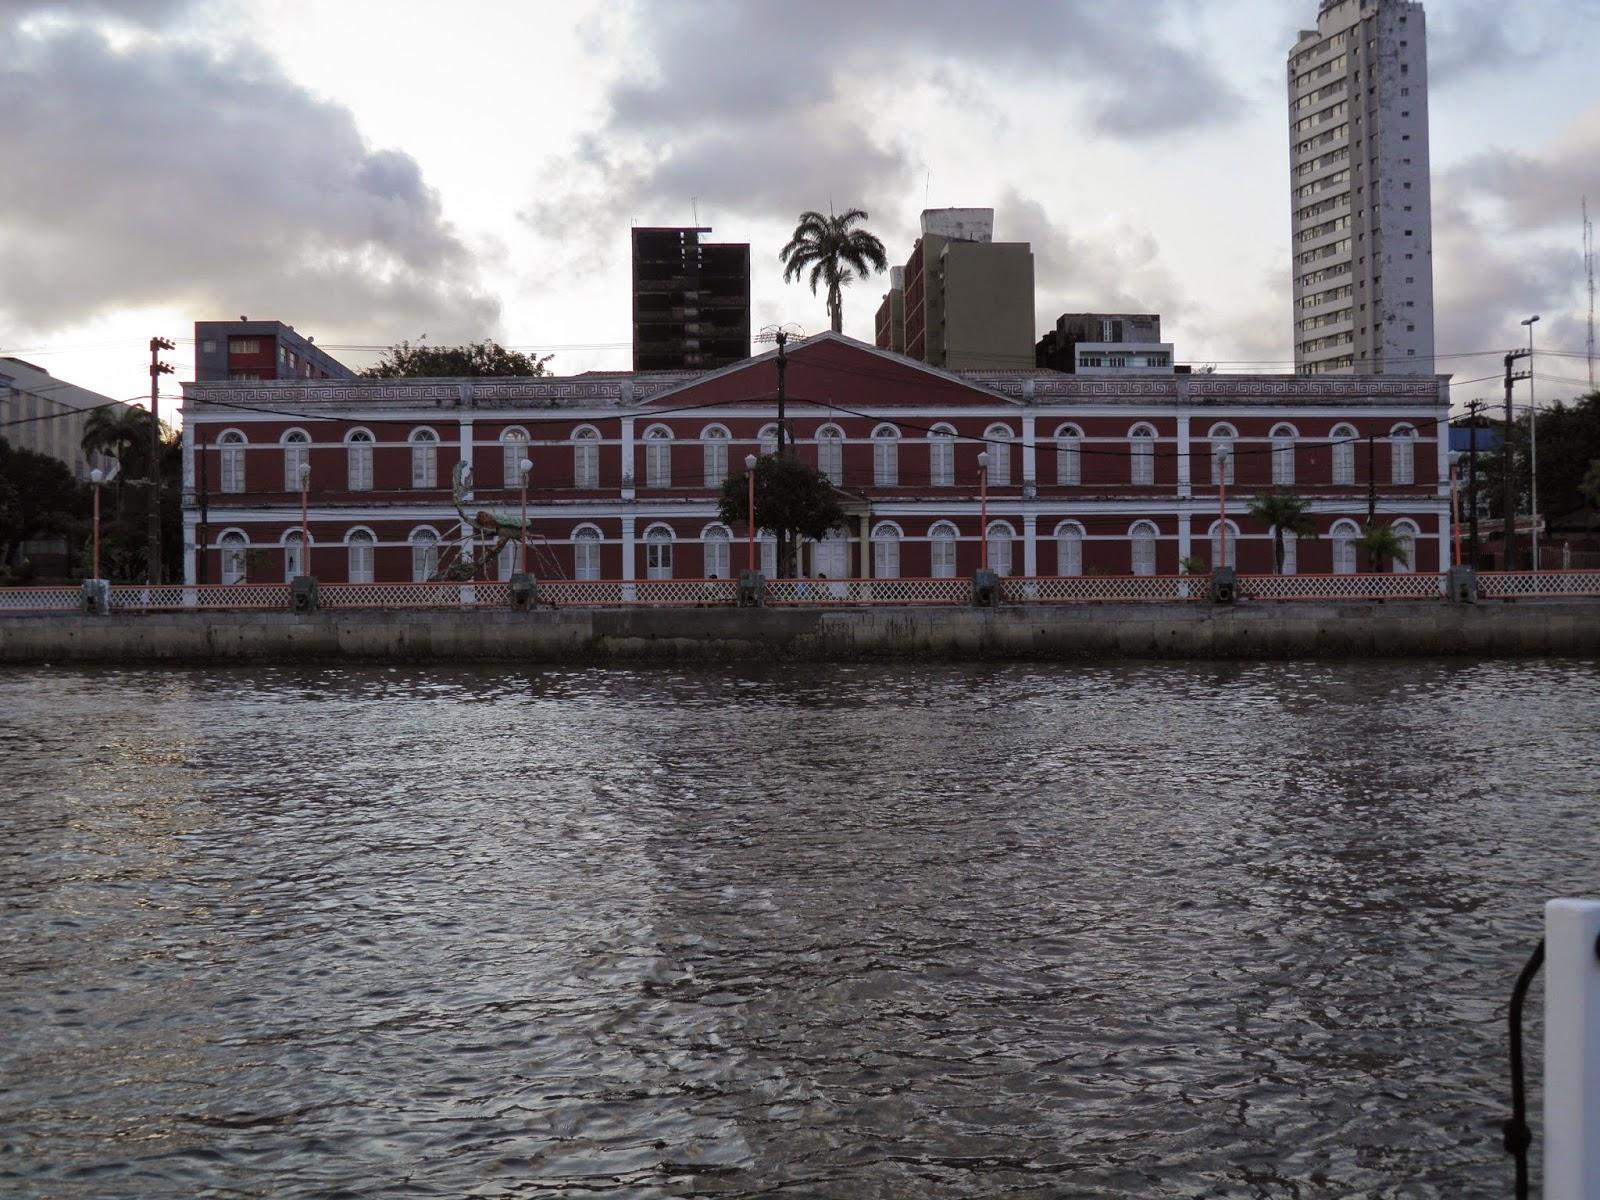 RECIFE; GINÁSIO PERNAMBUCANO; RECIFE; TURISMO; PASSEIO DE BARCO; PASSEIO DE CATAMARÃ; RIO CAPIBARIBE